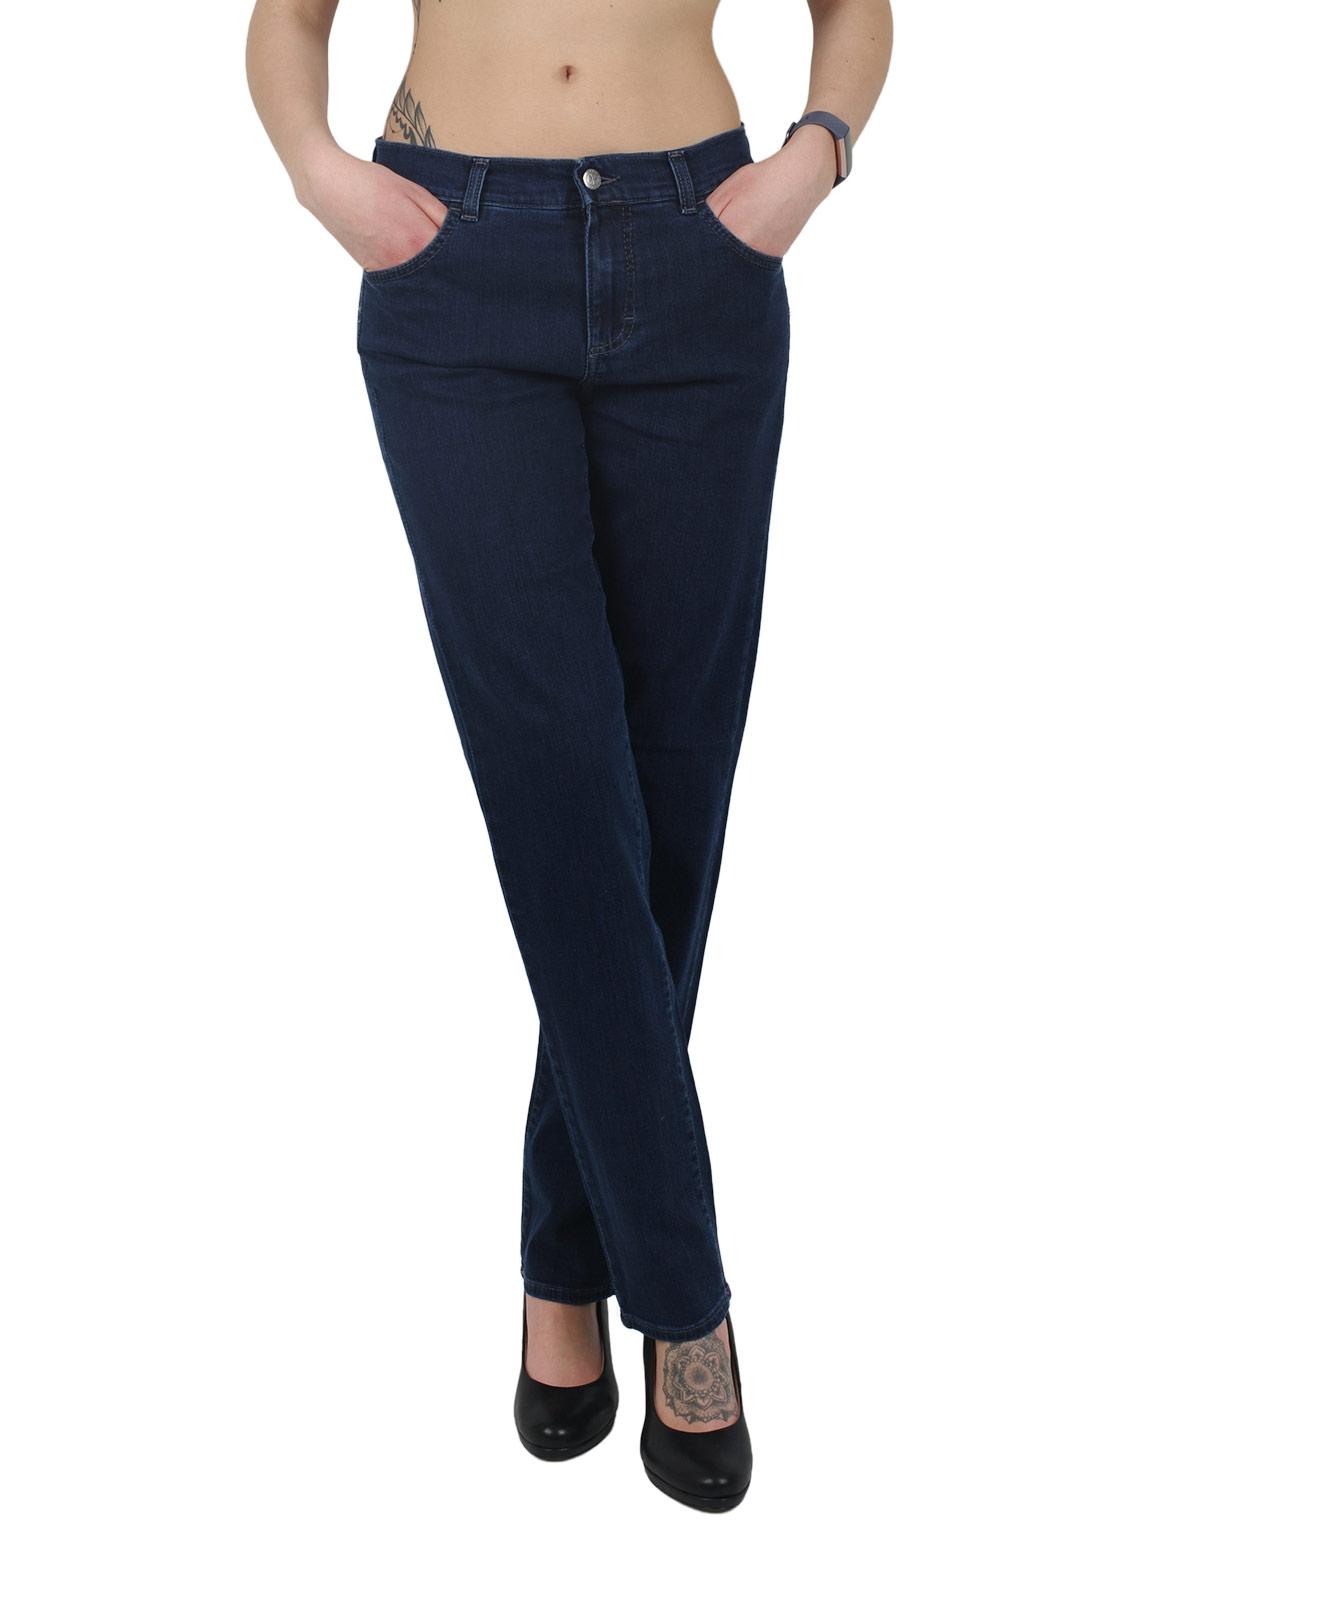 Hosen - Angels Mom Jeans Dolly in Dark Indigo  - Onlineshop Jeans Meile